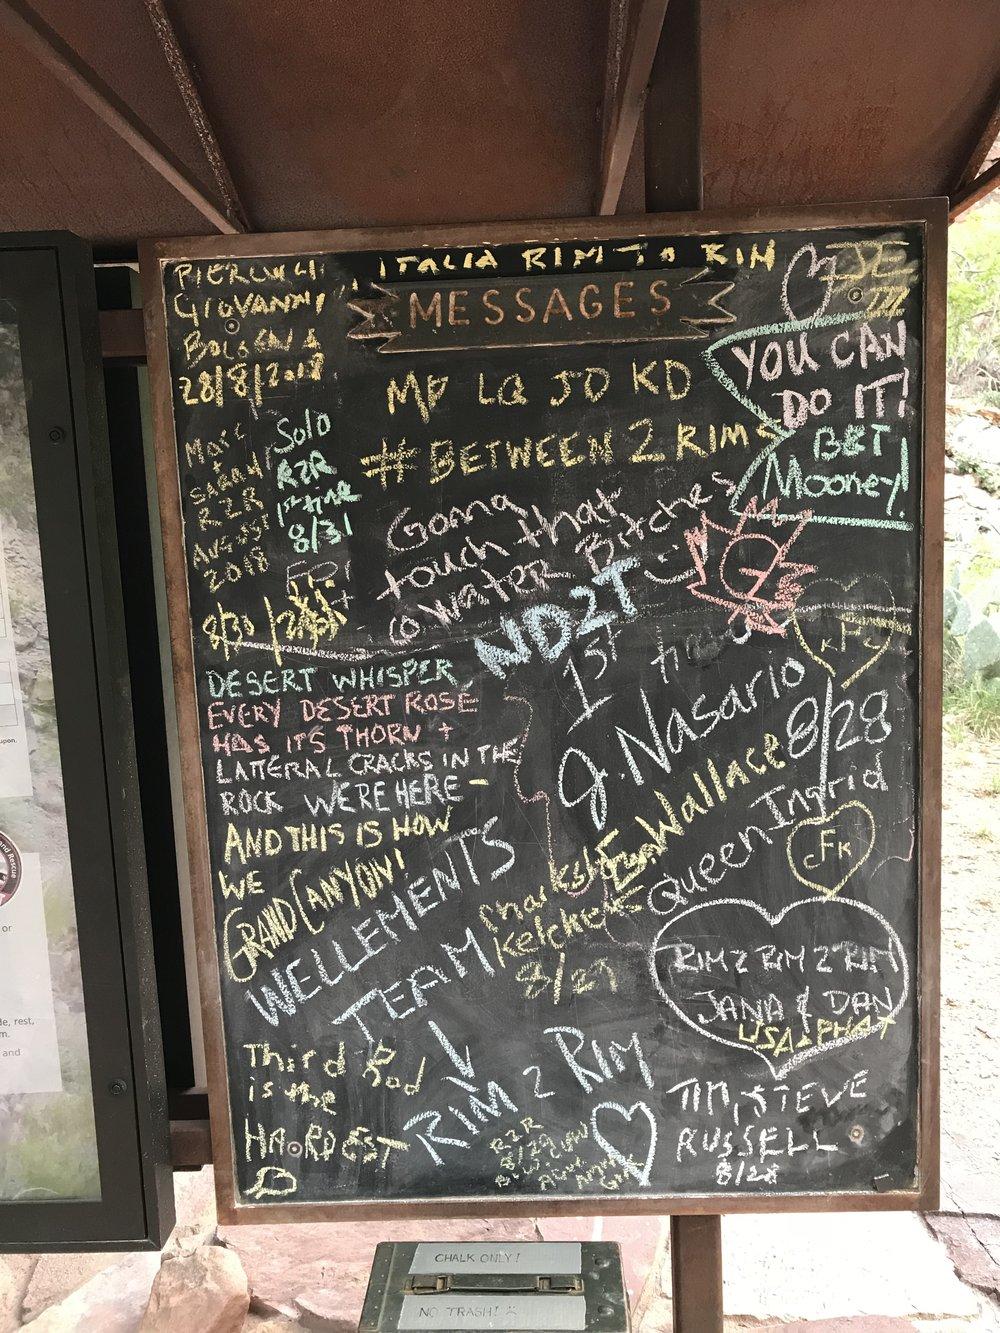 Messages of inspiration at Menzanita Spring.